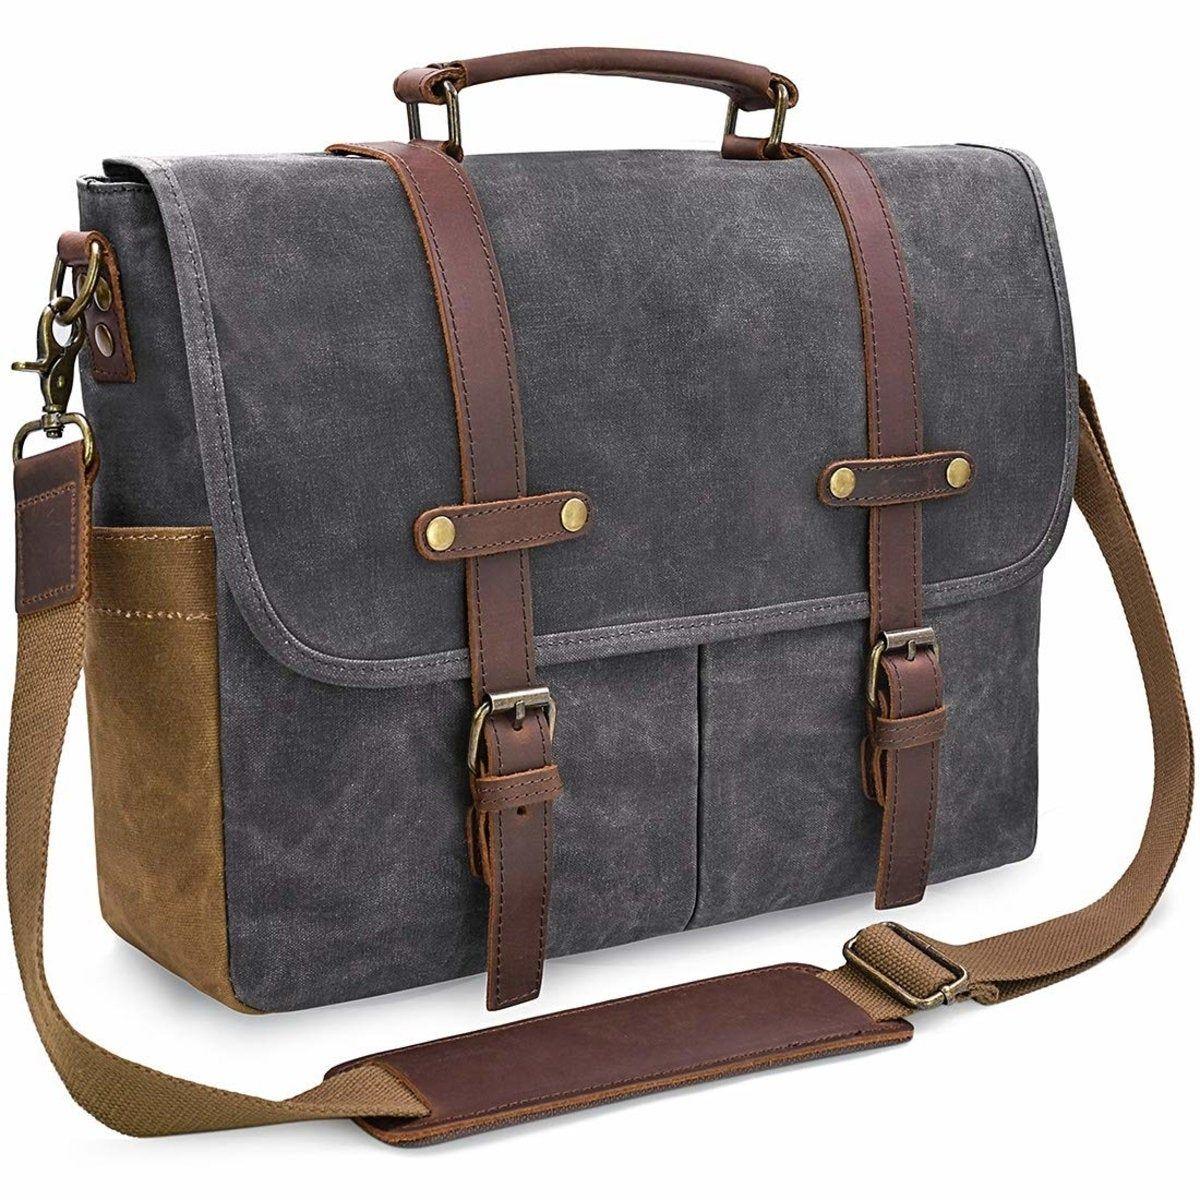 Unisex Vintage Large Mens Waxed Canvas Leather 14 Laptop Messenger Shoulder Bags School Book Bag Satchel